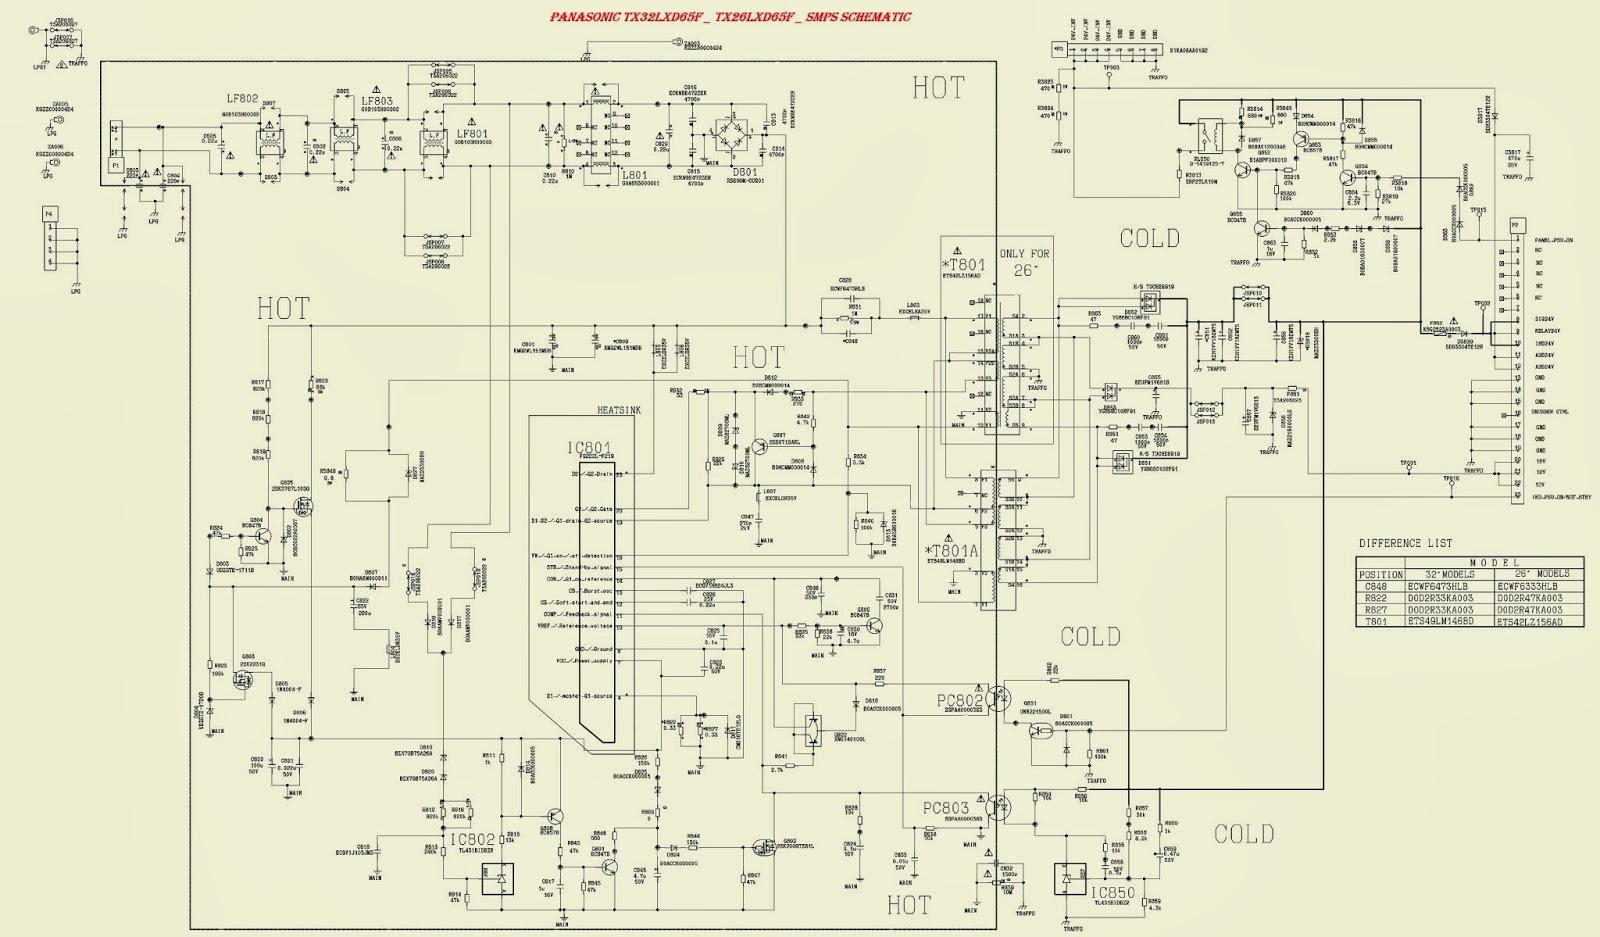 PANASONIC TX26LXD65F  TX32LXD65F  SMPS (Power Supply